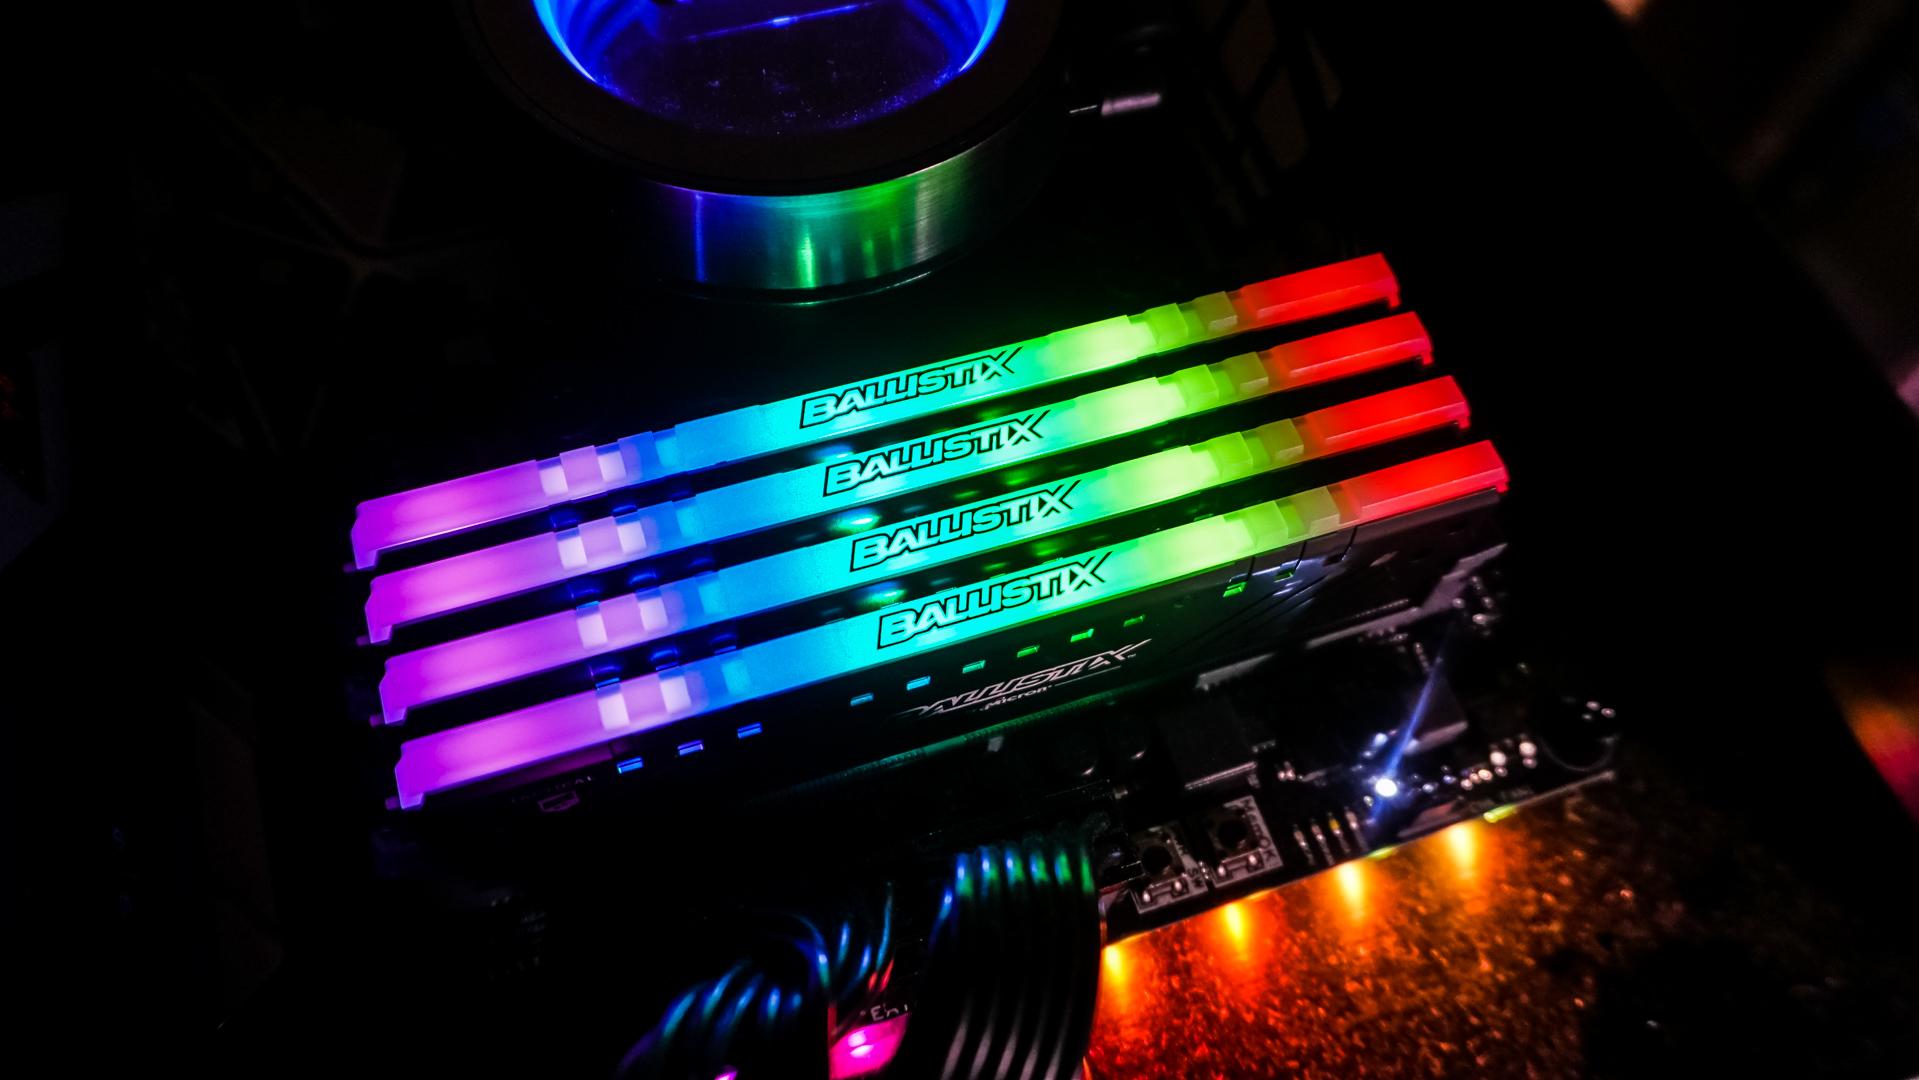 Ballistix Tactical Tracer RGB 32GB Kit (4x8GB) DDR4-2666 CL16 DIMM Arbeitsspeicher